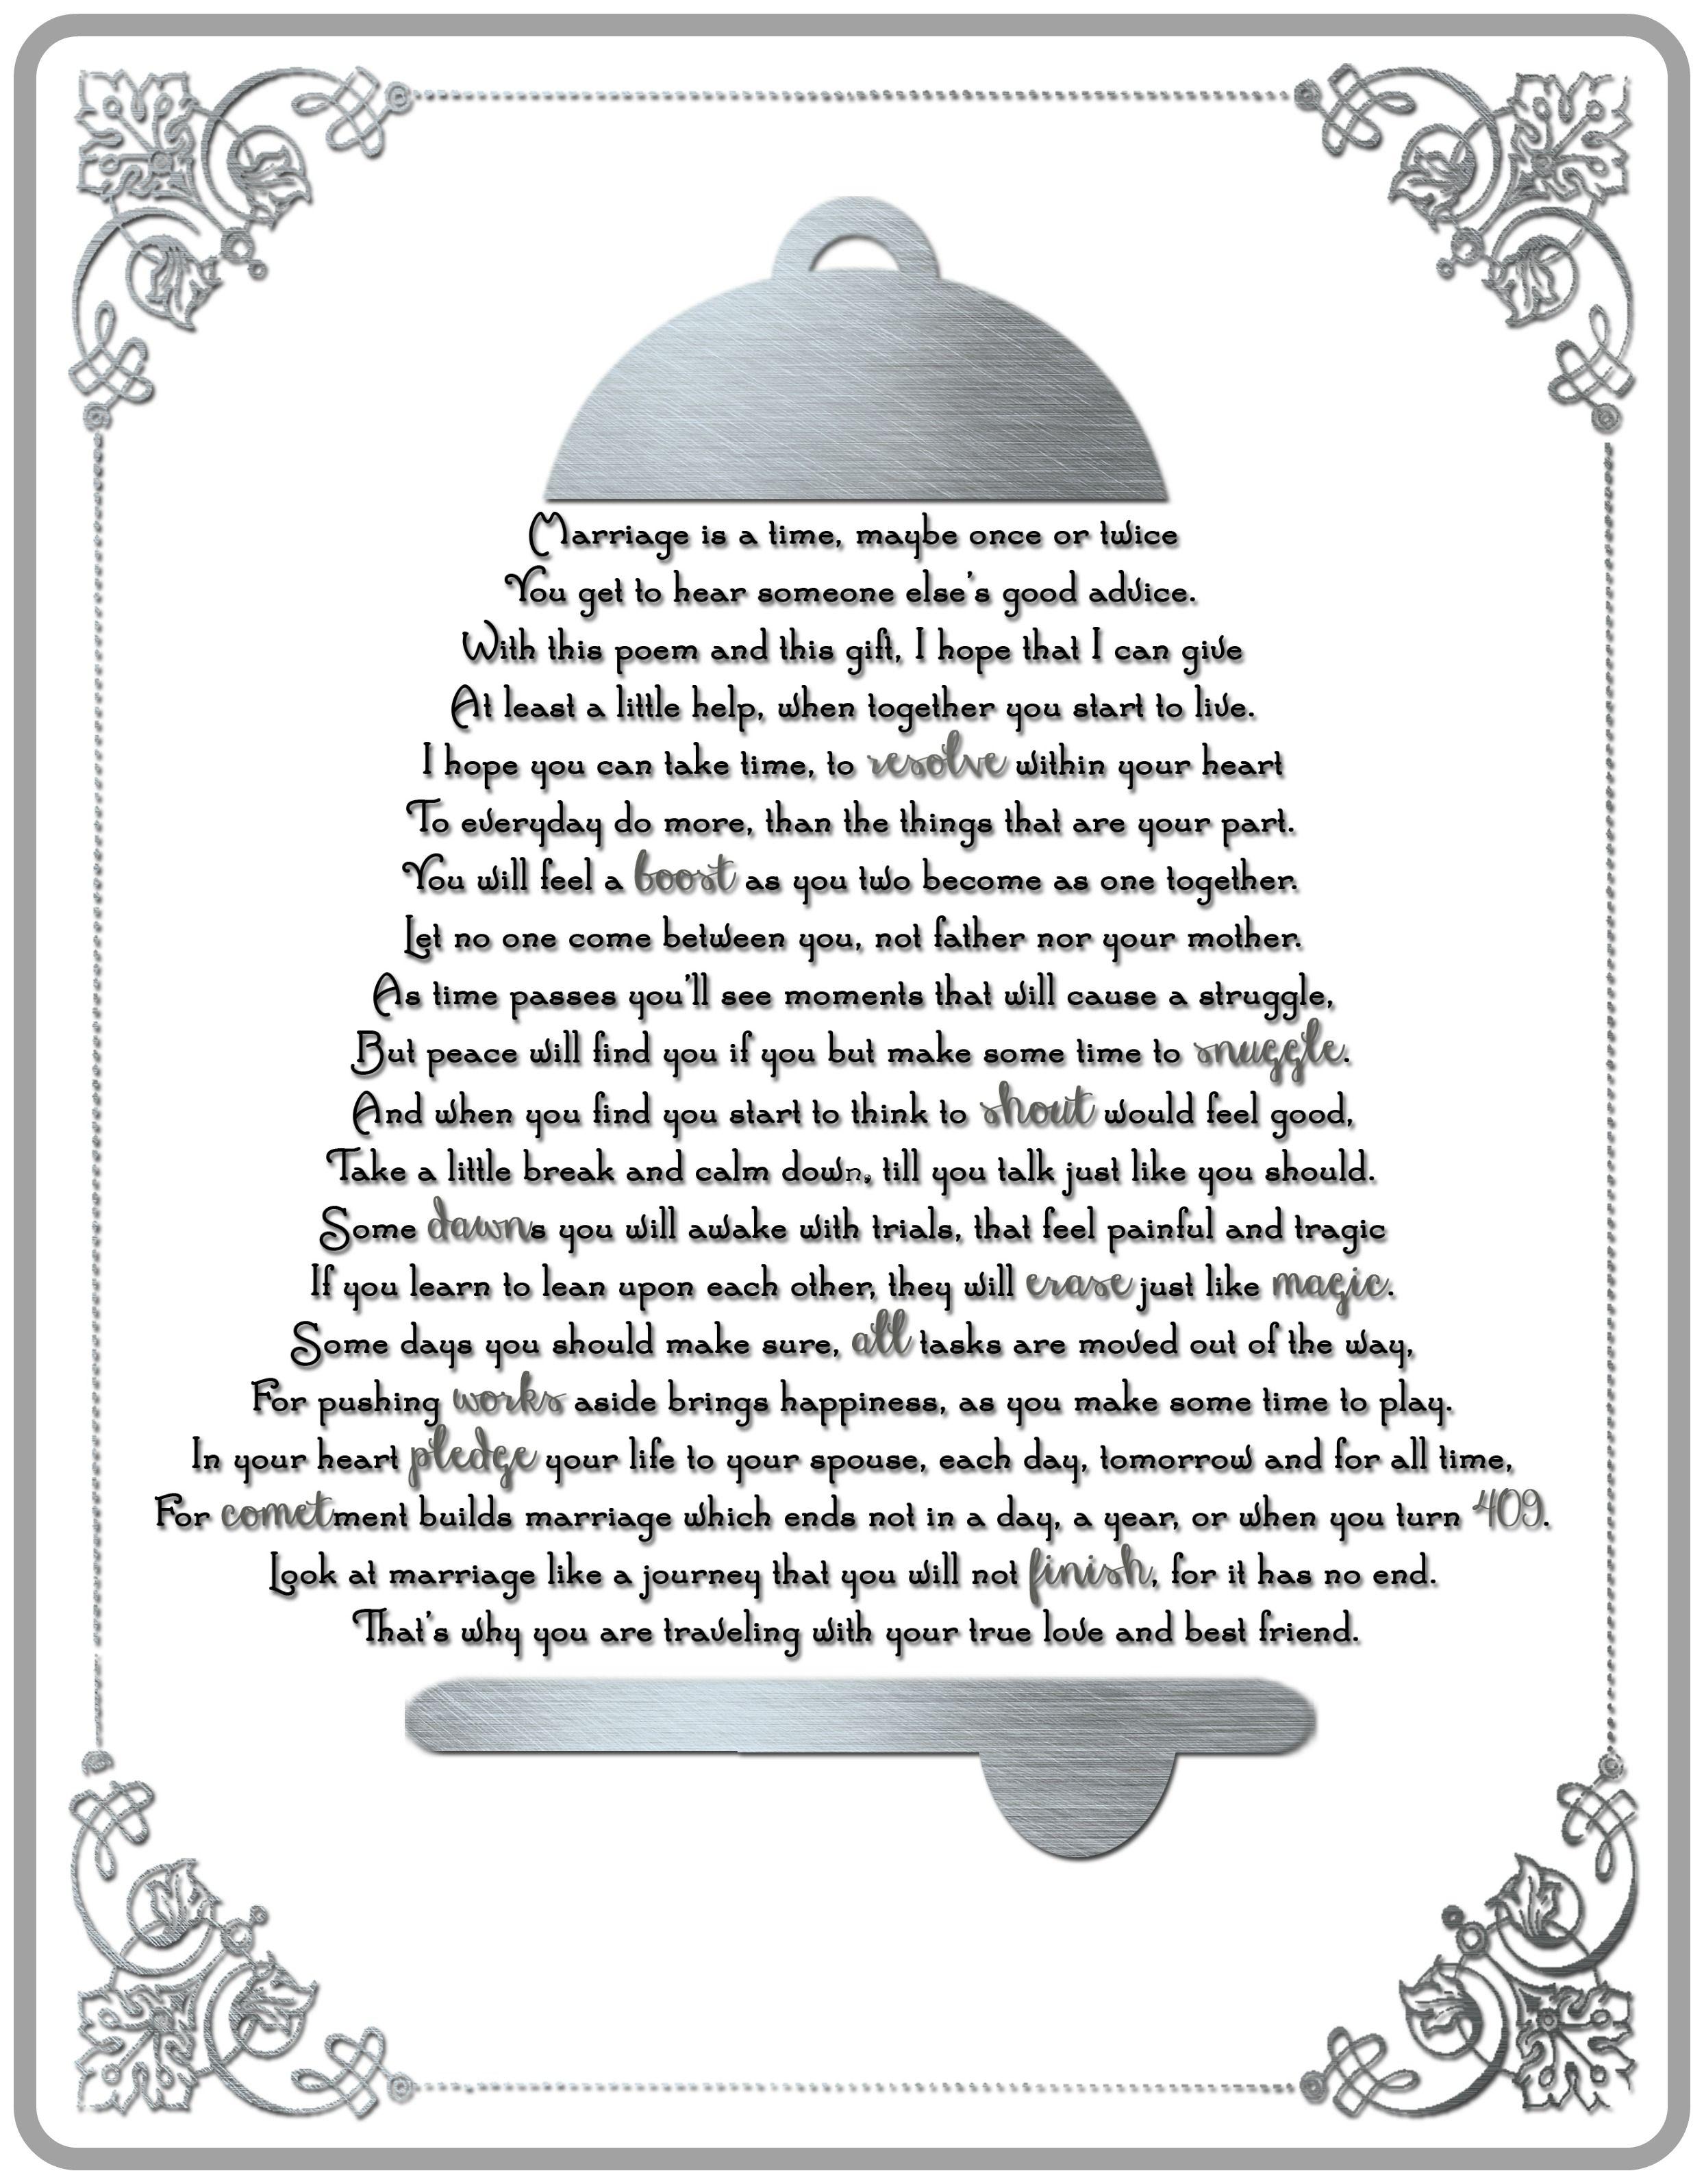 Bluehost Com Bridal Shower Invitations Rustic Bridal Shower Invitations Bridal Shower Poems